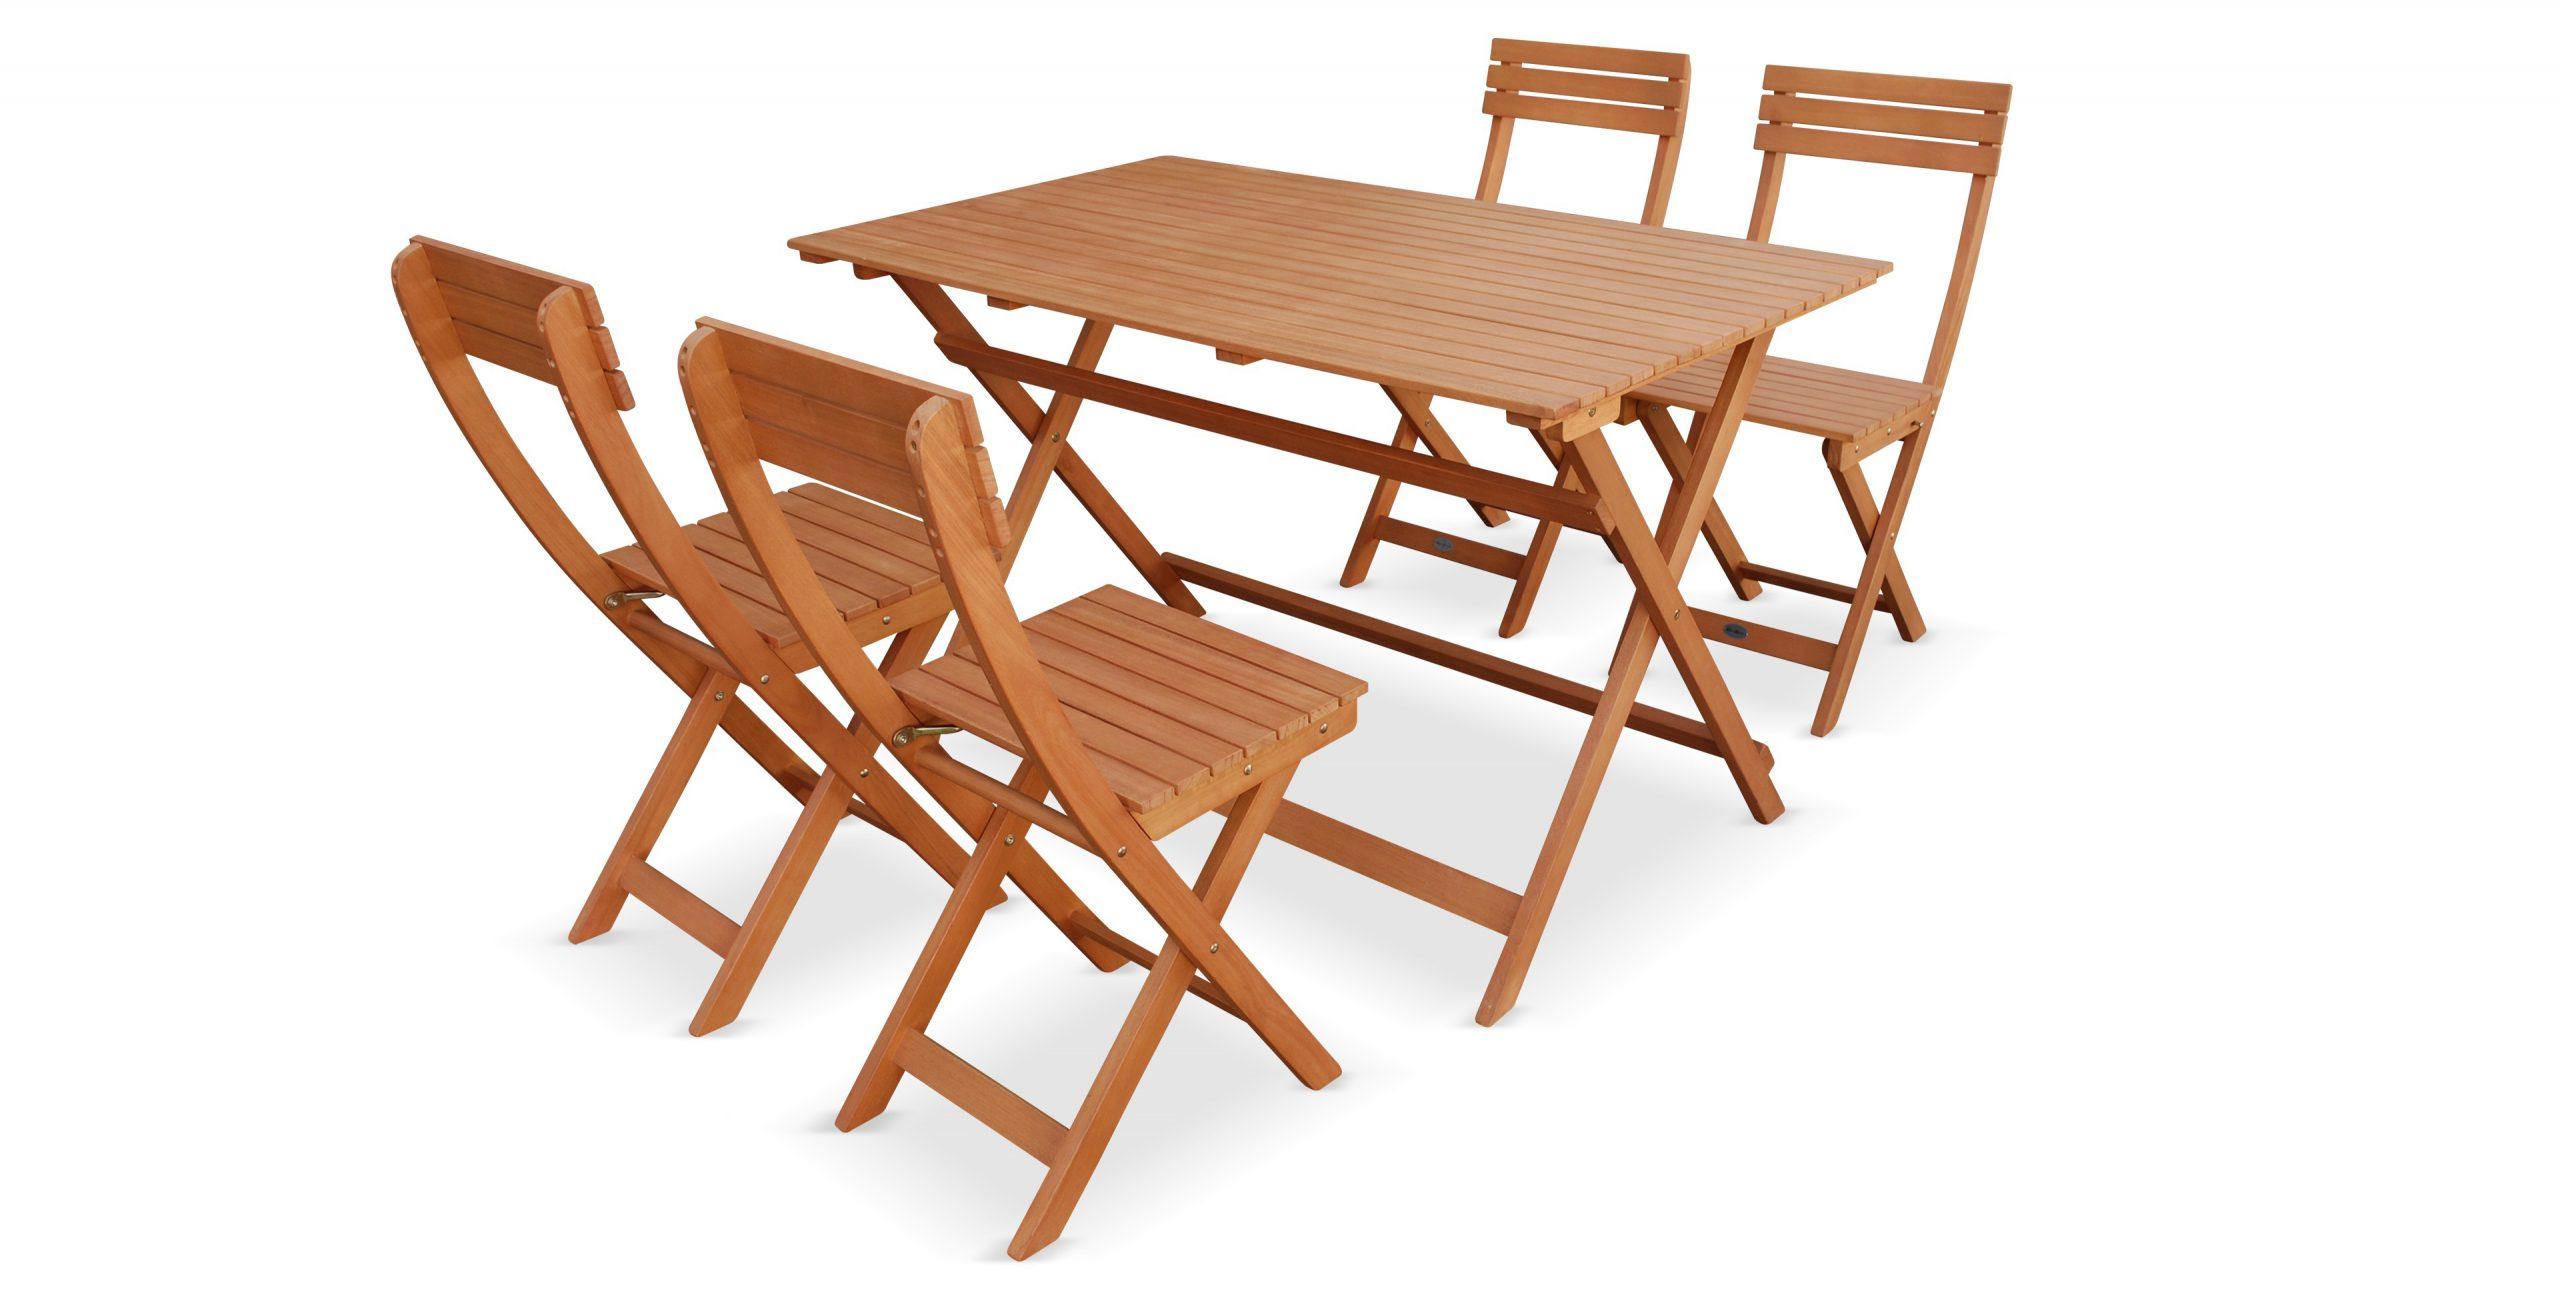 De Pliante Table Bois Pliante De Jardin Jardin Bois Table ... à Table Et Chaise De Jardin En Bois